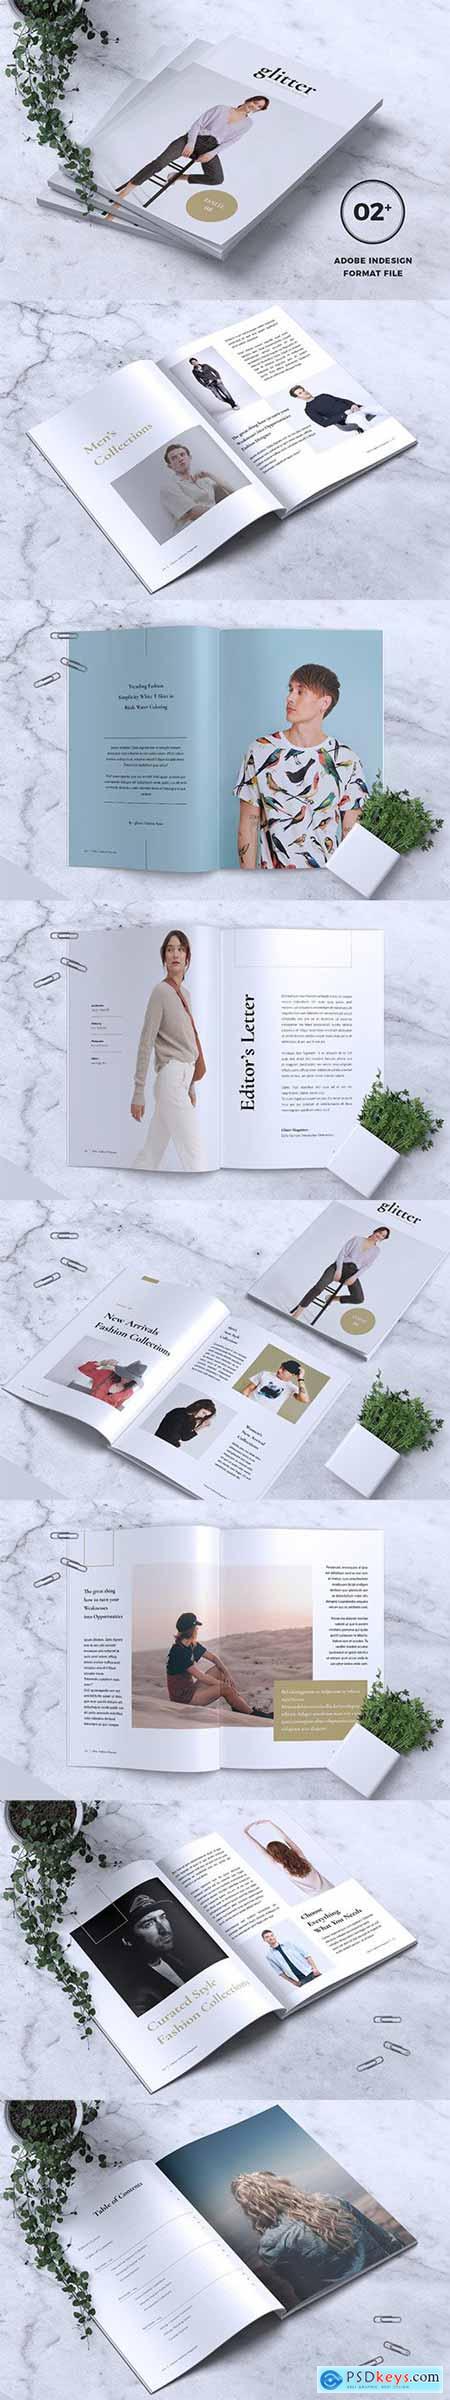 GLITTER Minimal Fashion Magazine